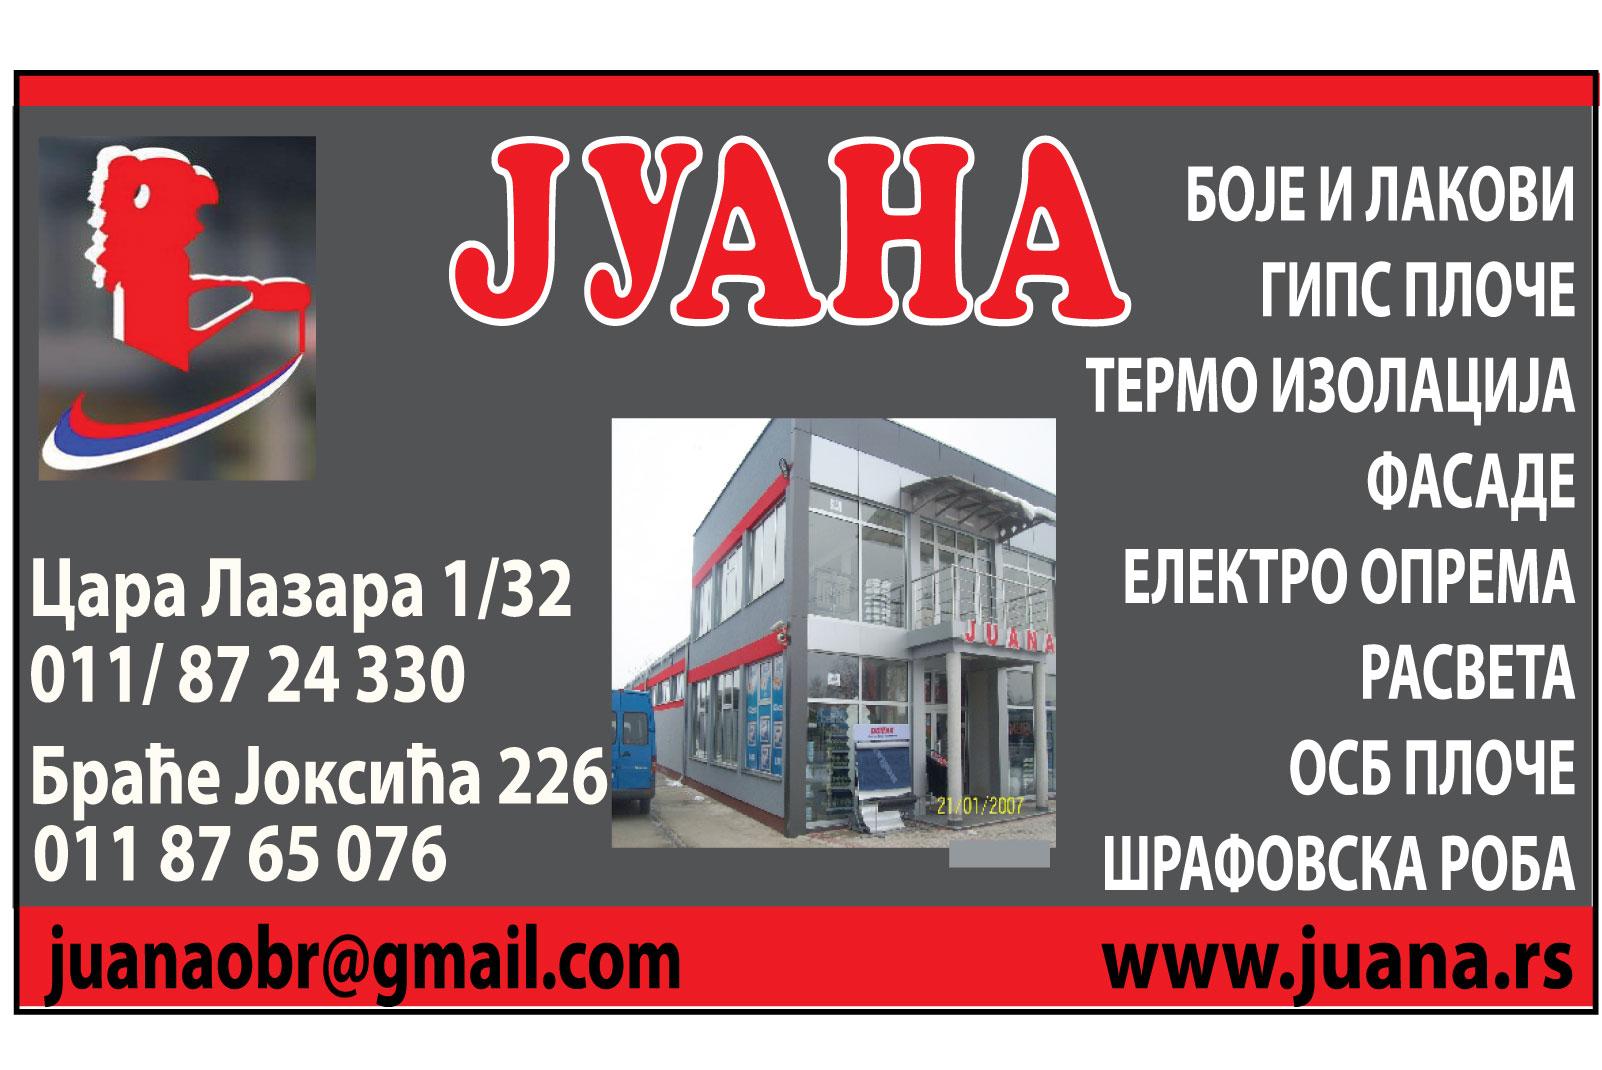 Juana-obrenovac -zvecka-farbara-boje-lakovi-izolacija-stiropor-fasade-krecenje-gradnja-renoviranje-gradjevina-materijali-stovariste-mojabaza